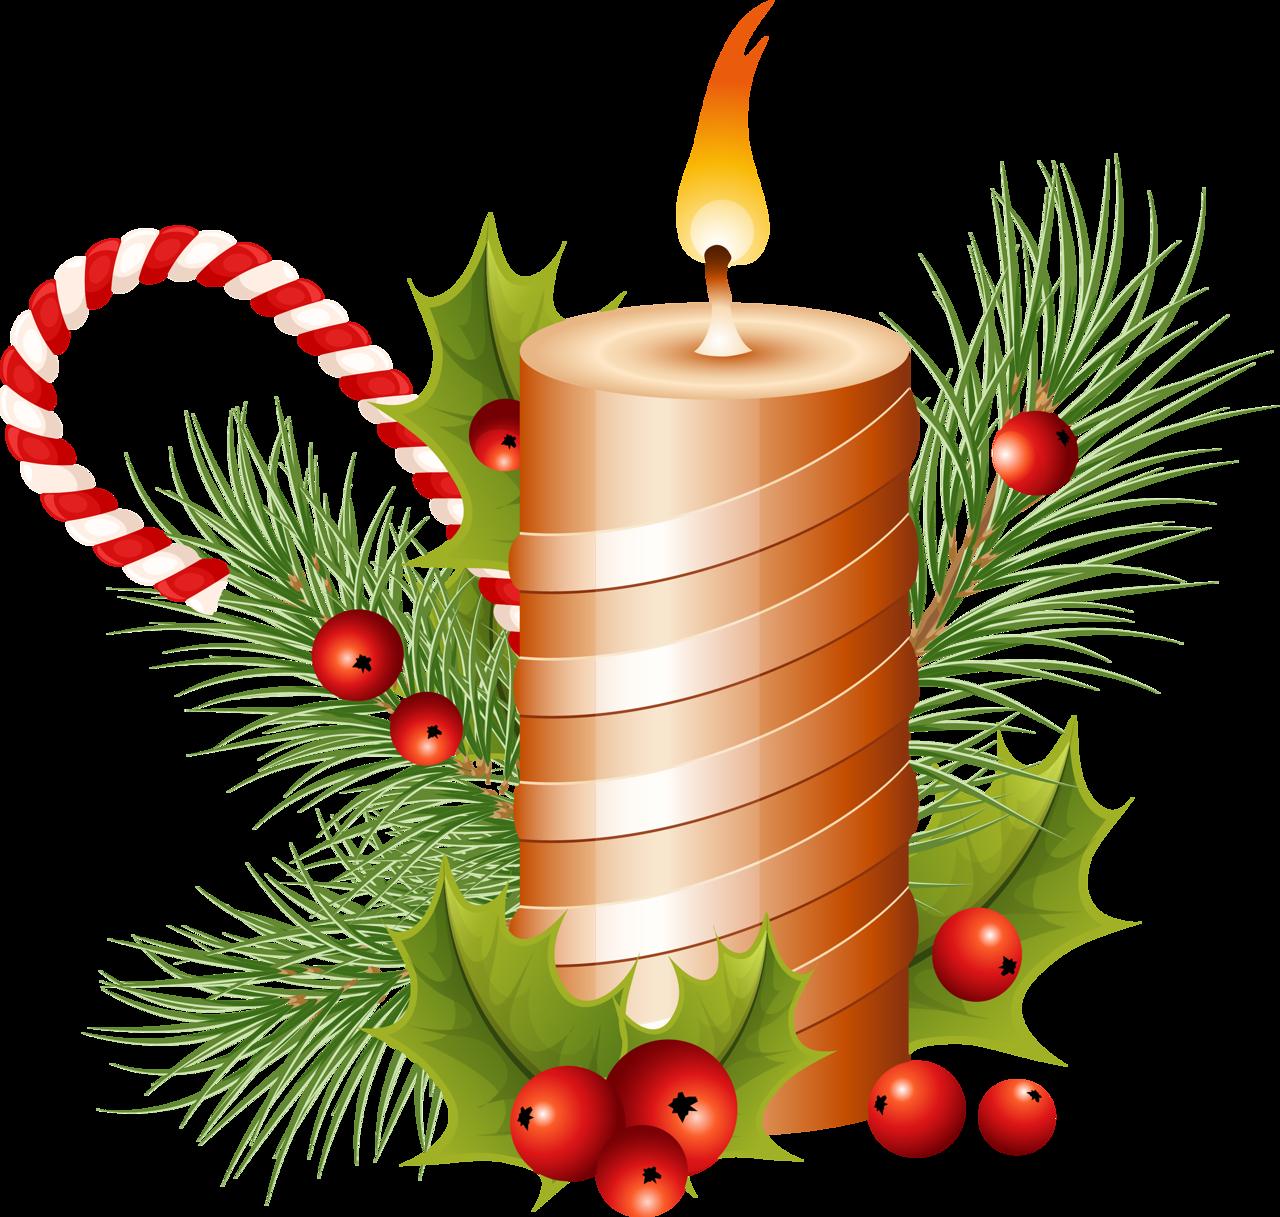 Sugar Cane Christmas Candle with Mistletoe PNG Image